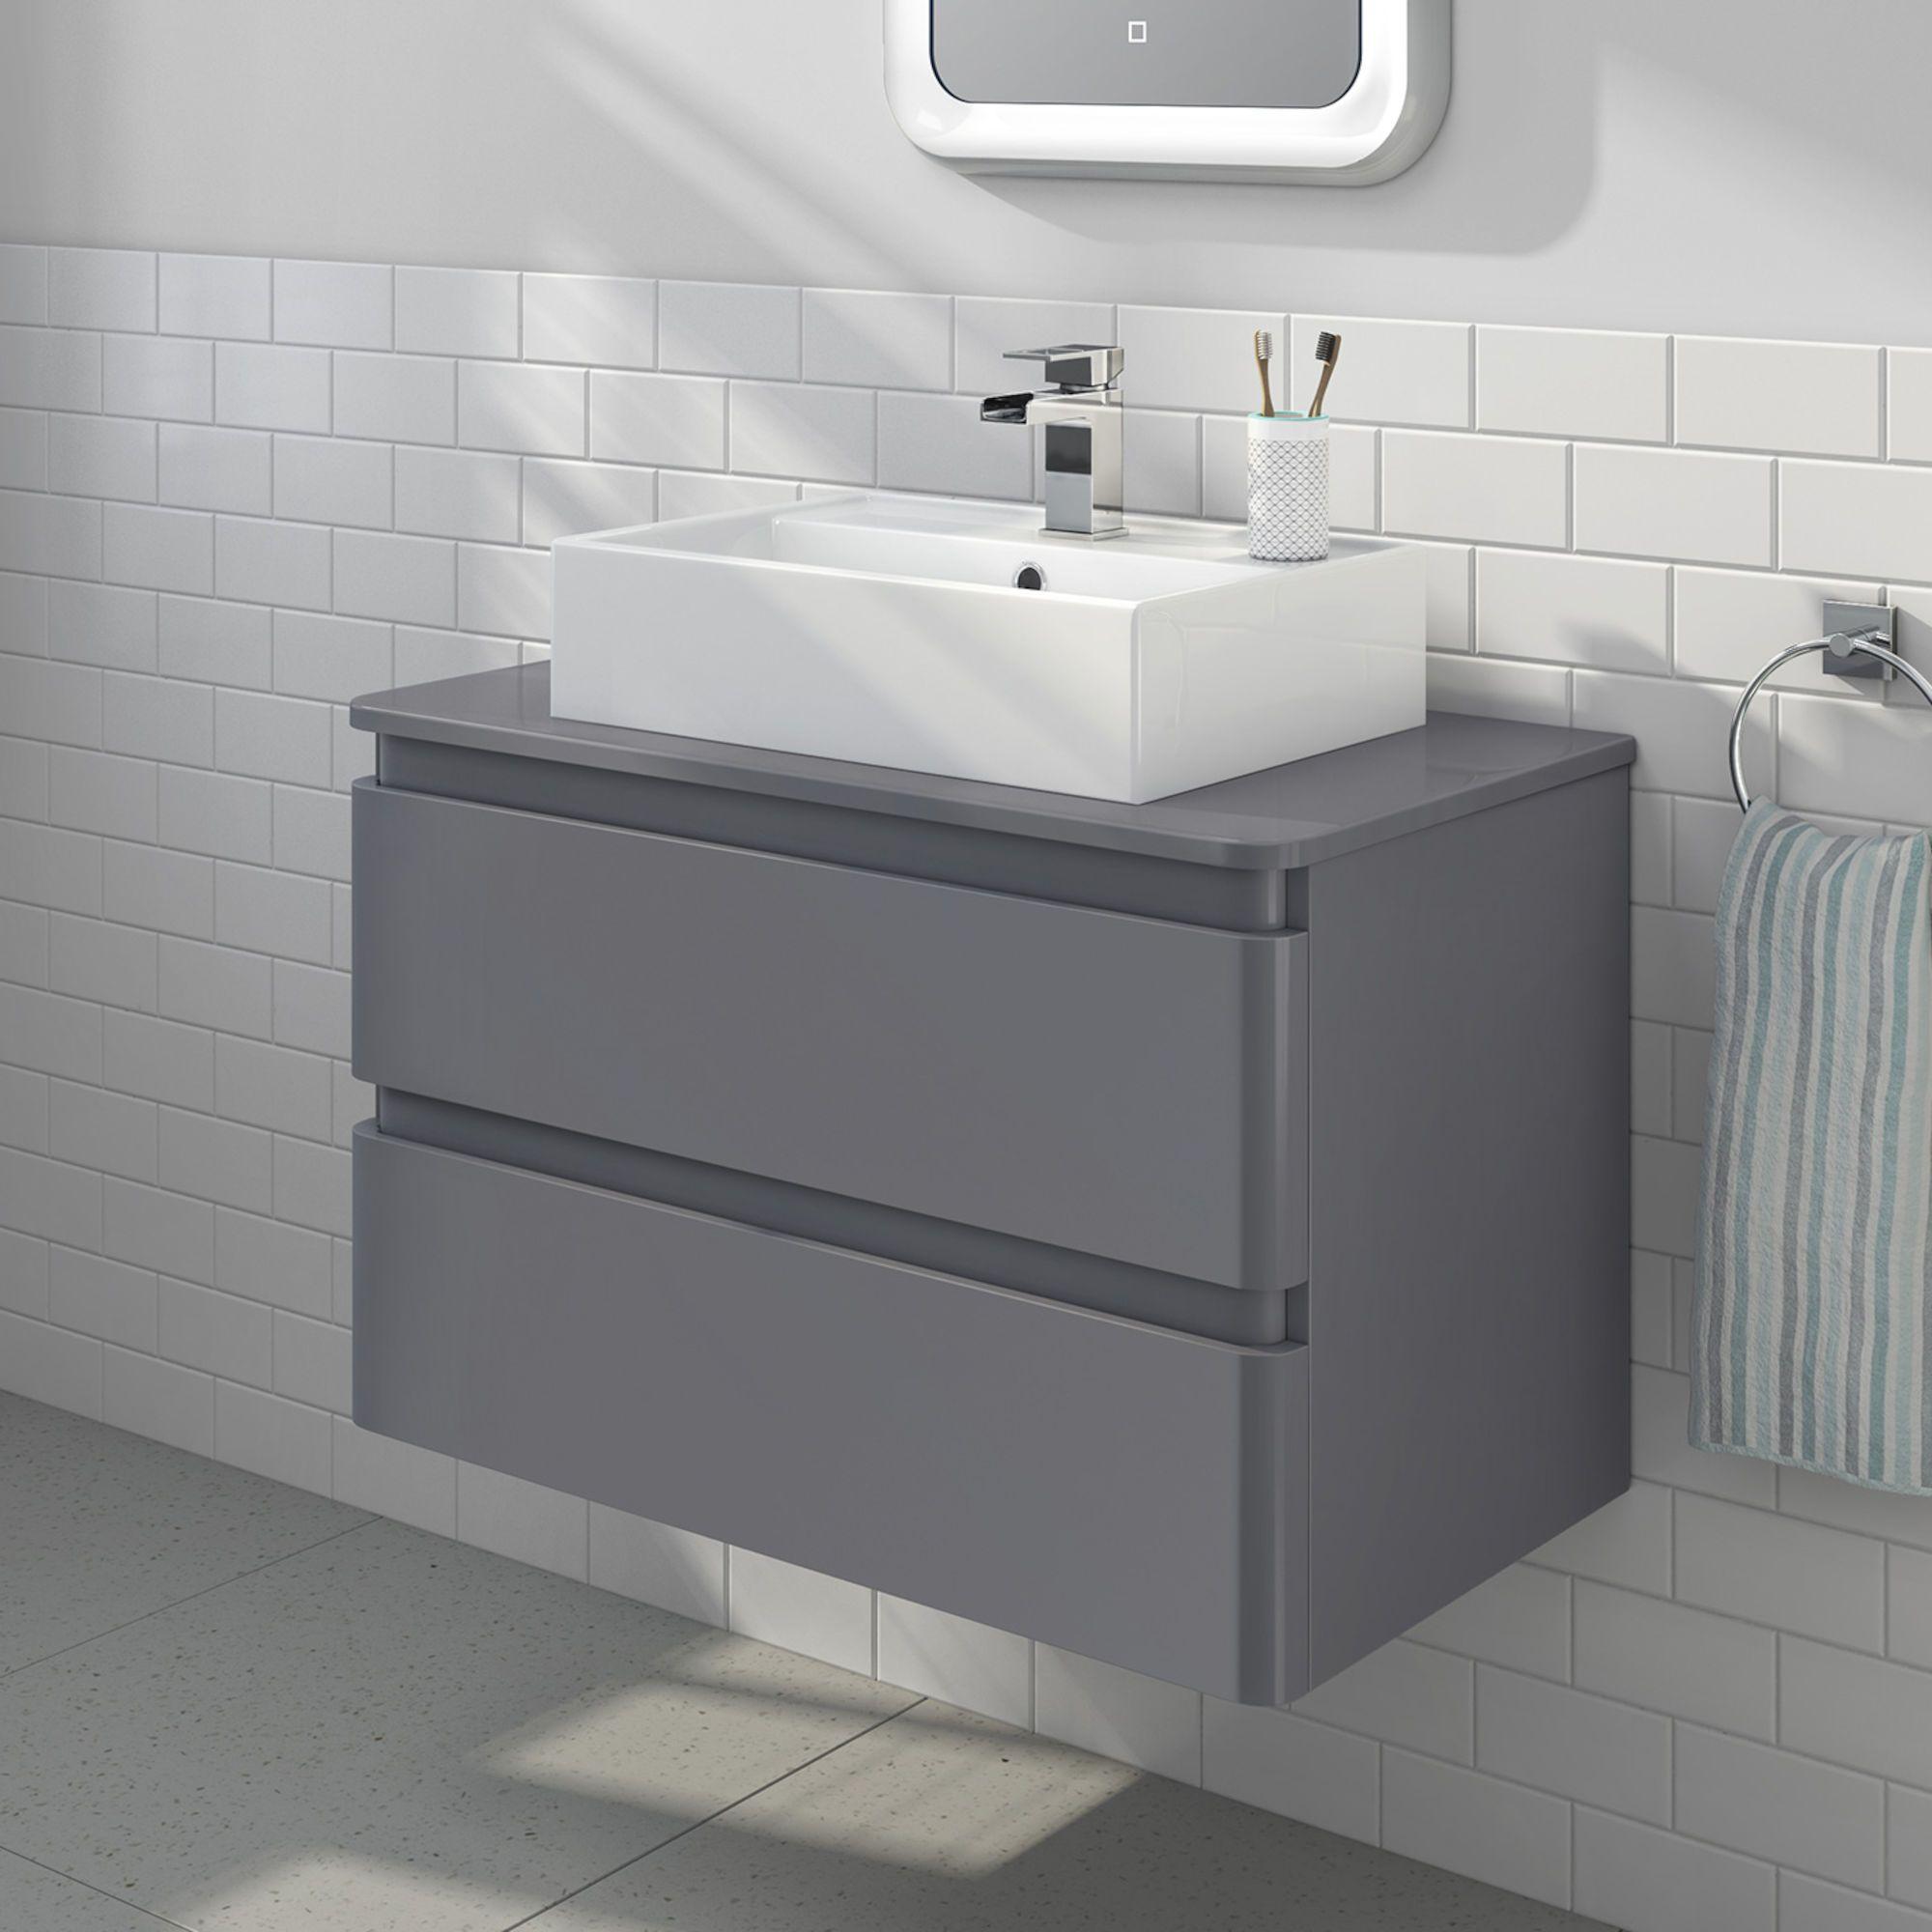 15++ Wall hung bathroom cabinet grey ideas